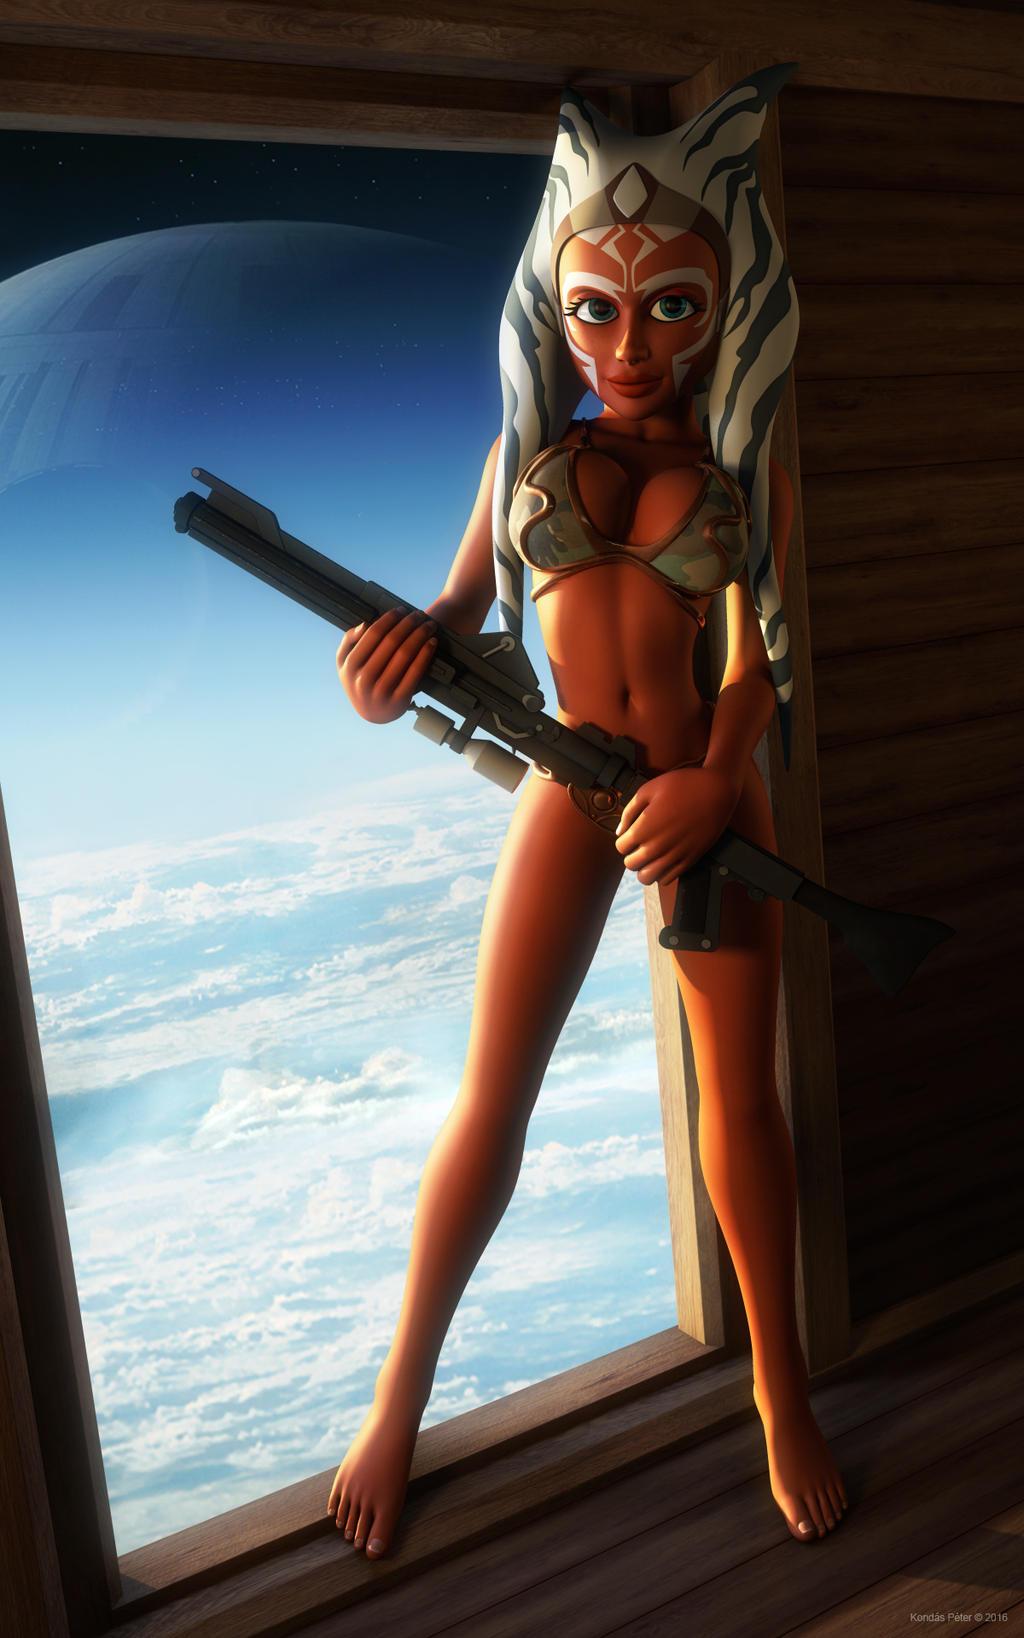 Rebel soldier Ahsoka Tano by kondaspeter1 on DeviantArt